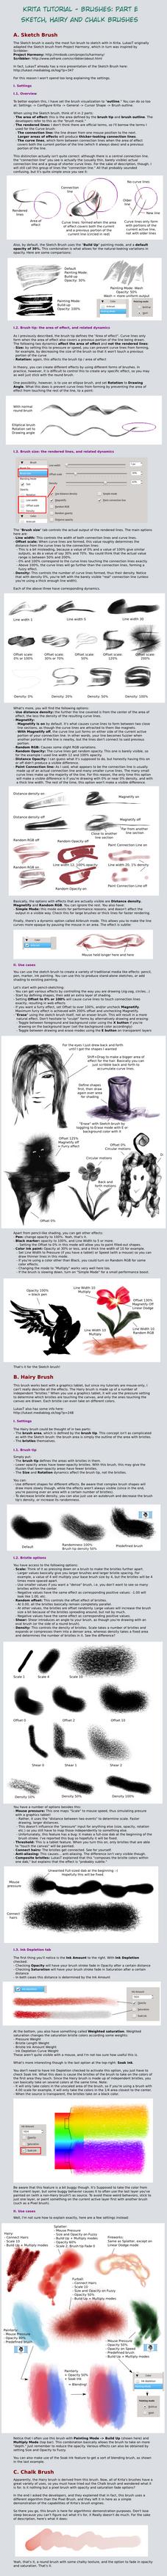 Krita Tutorial: Sketch, Hairy, Chalk Brushes by White-Heron